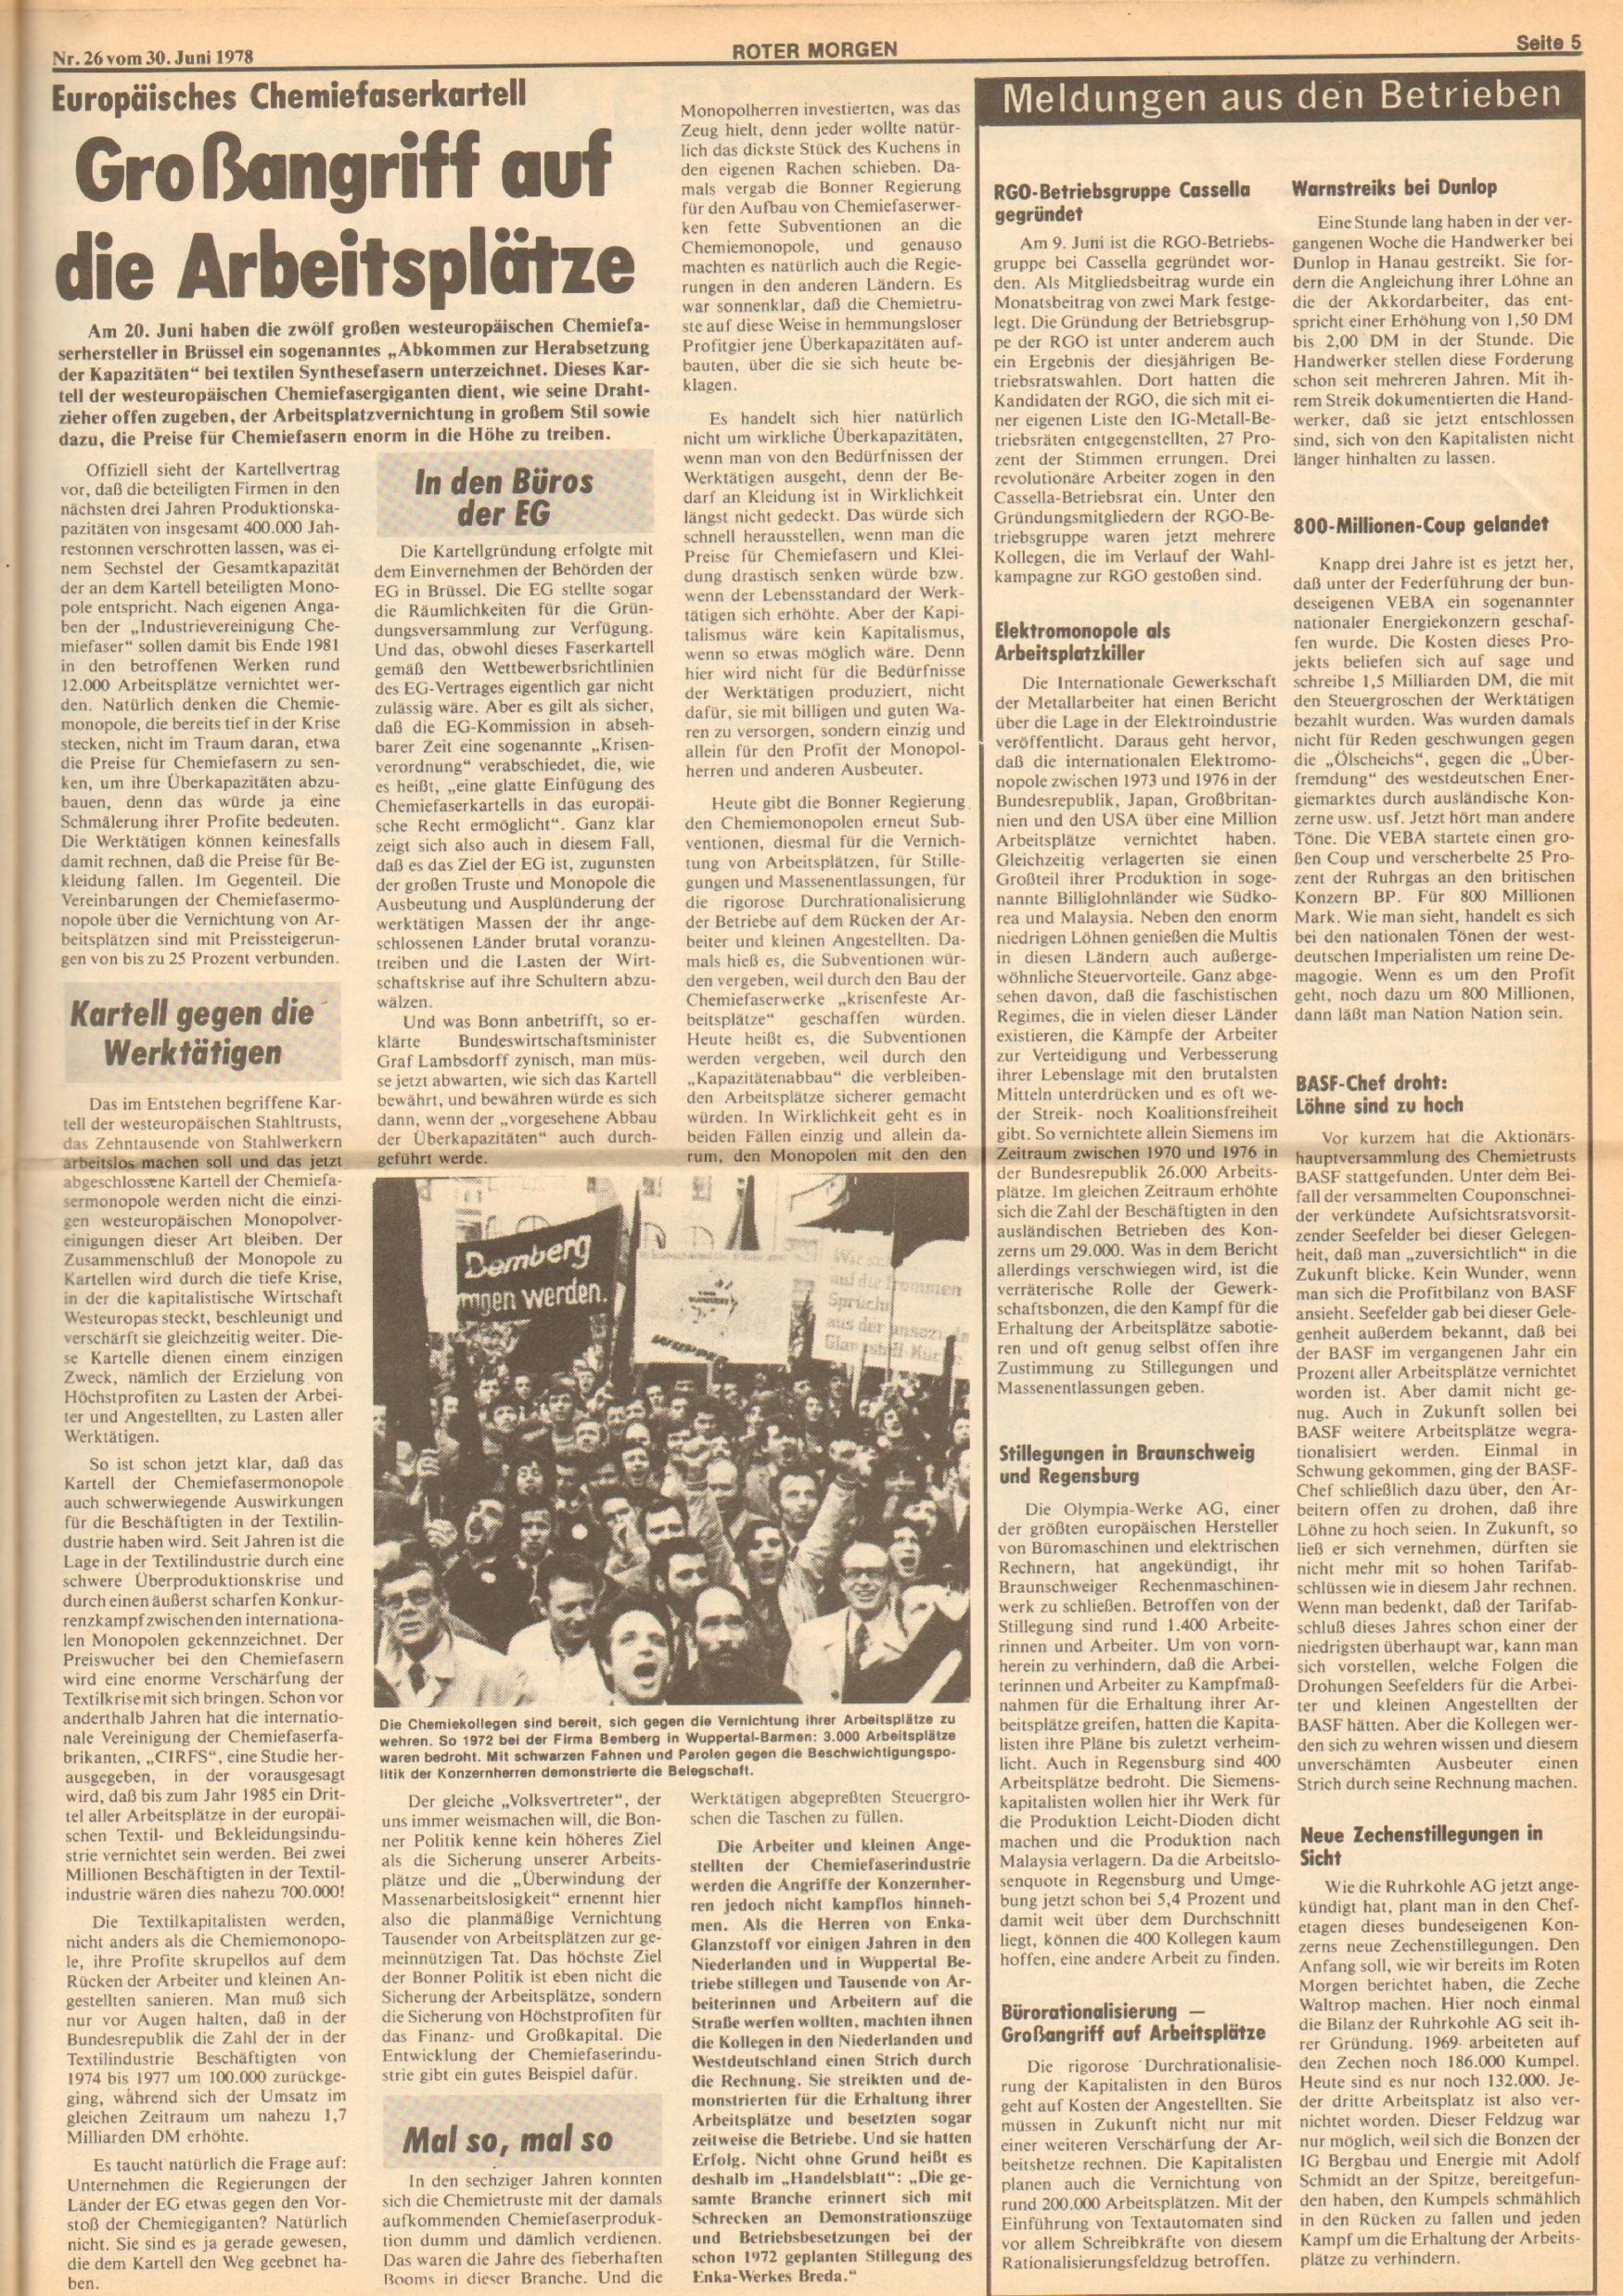 Roter Morgen, 12. Jg., 30. Juni 1978, Nr. 26, Seite 5